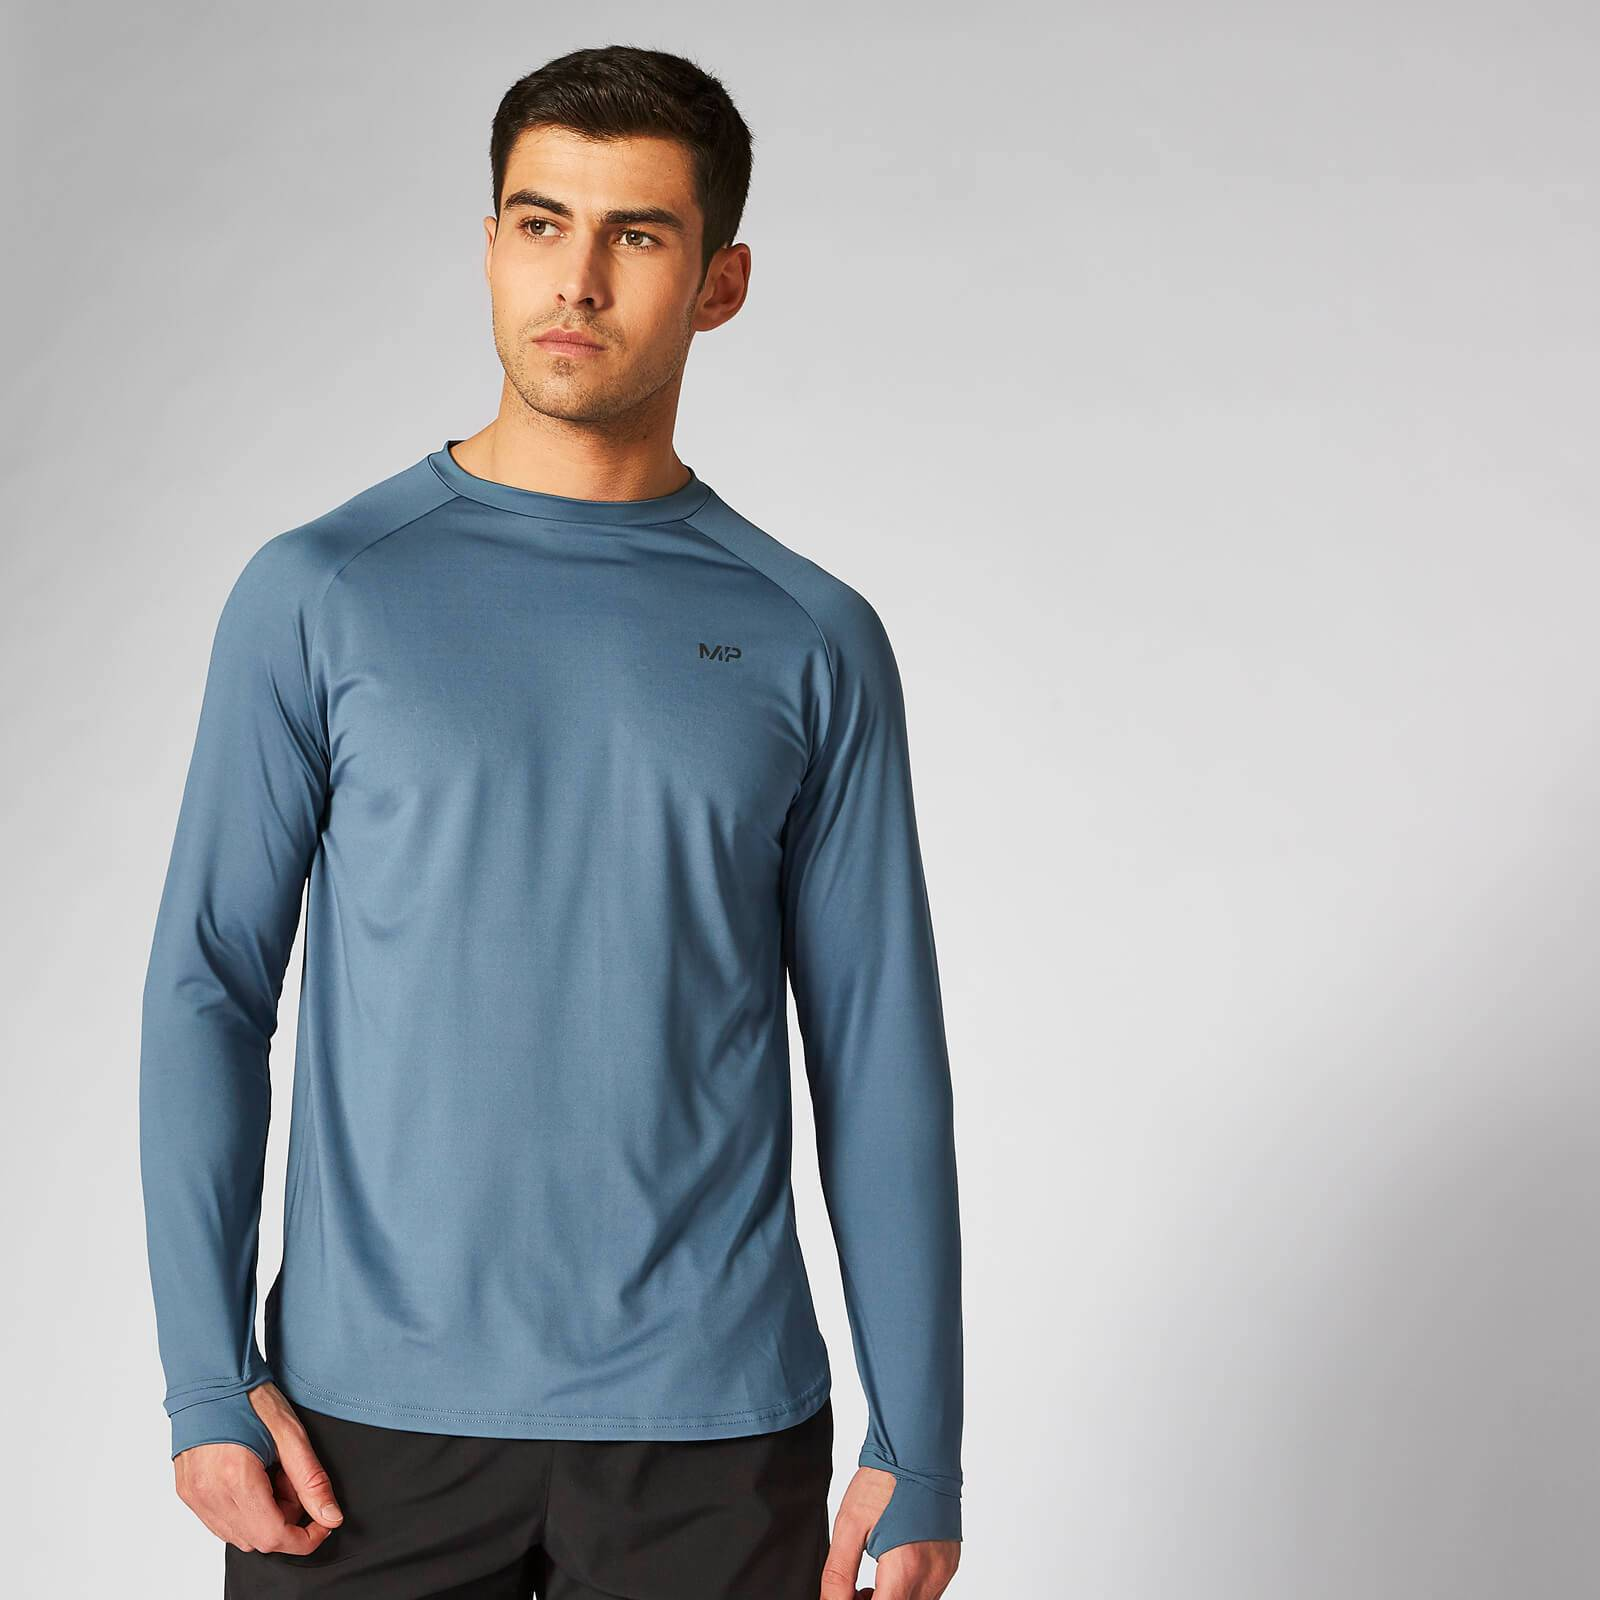 Myprotein Dry-Tech Infinity Long-Sleeve T-Shirt - Cadet Blue - XL